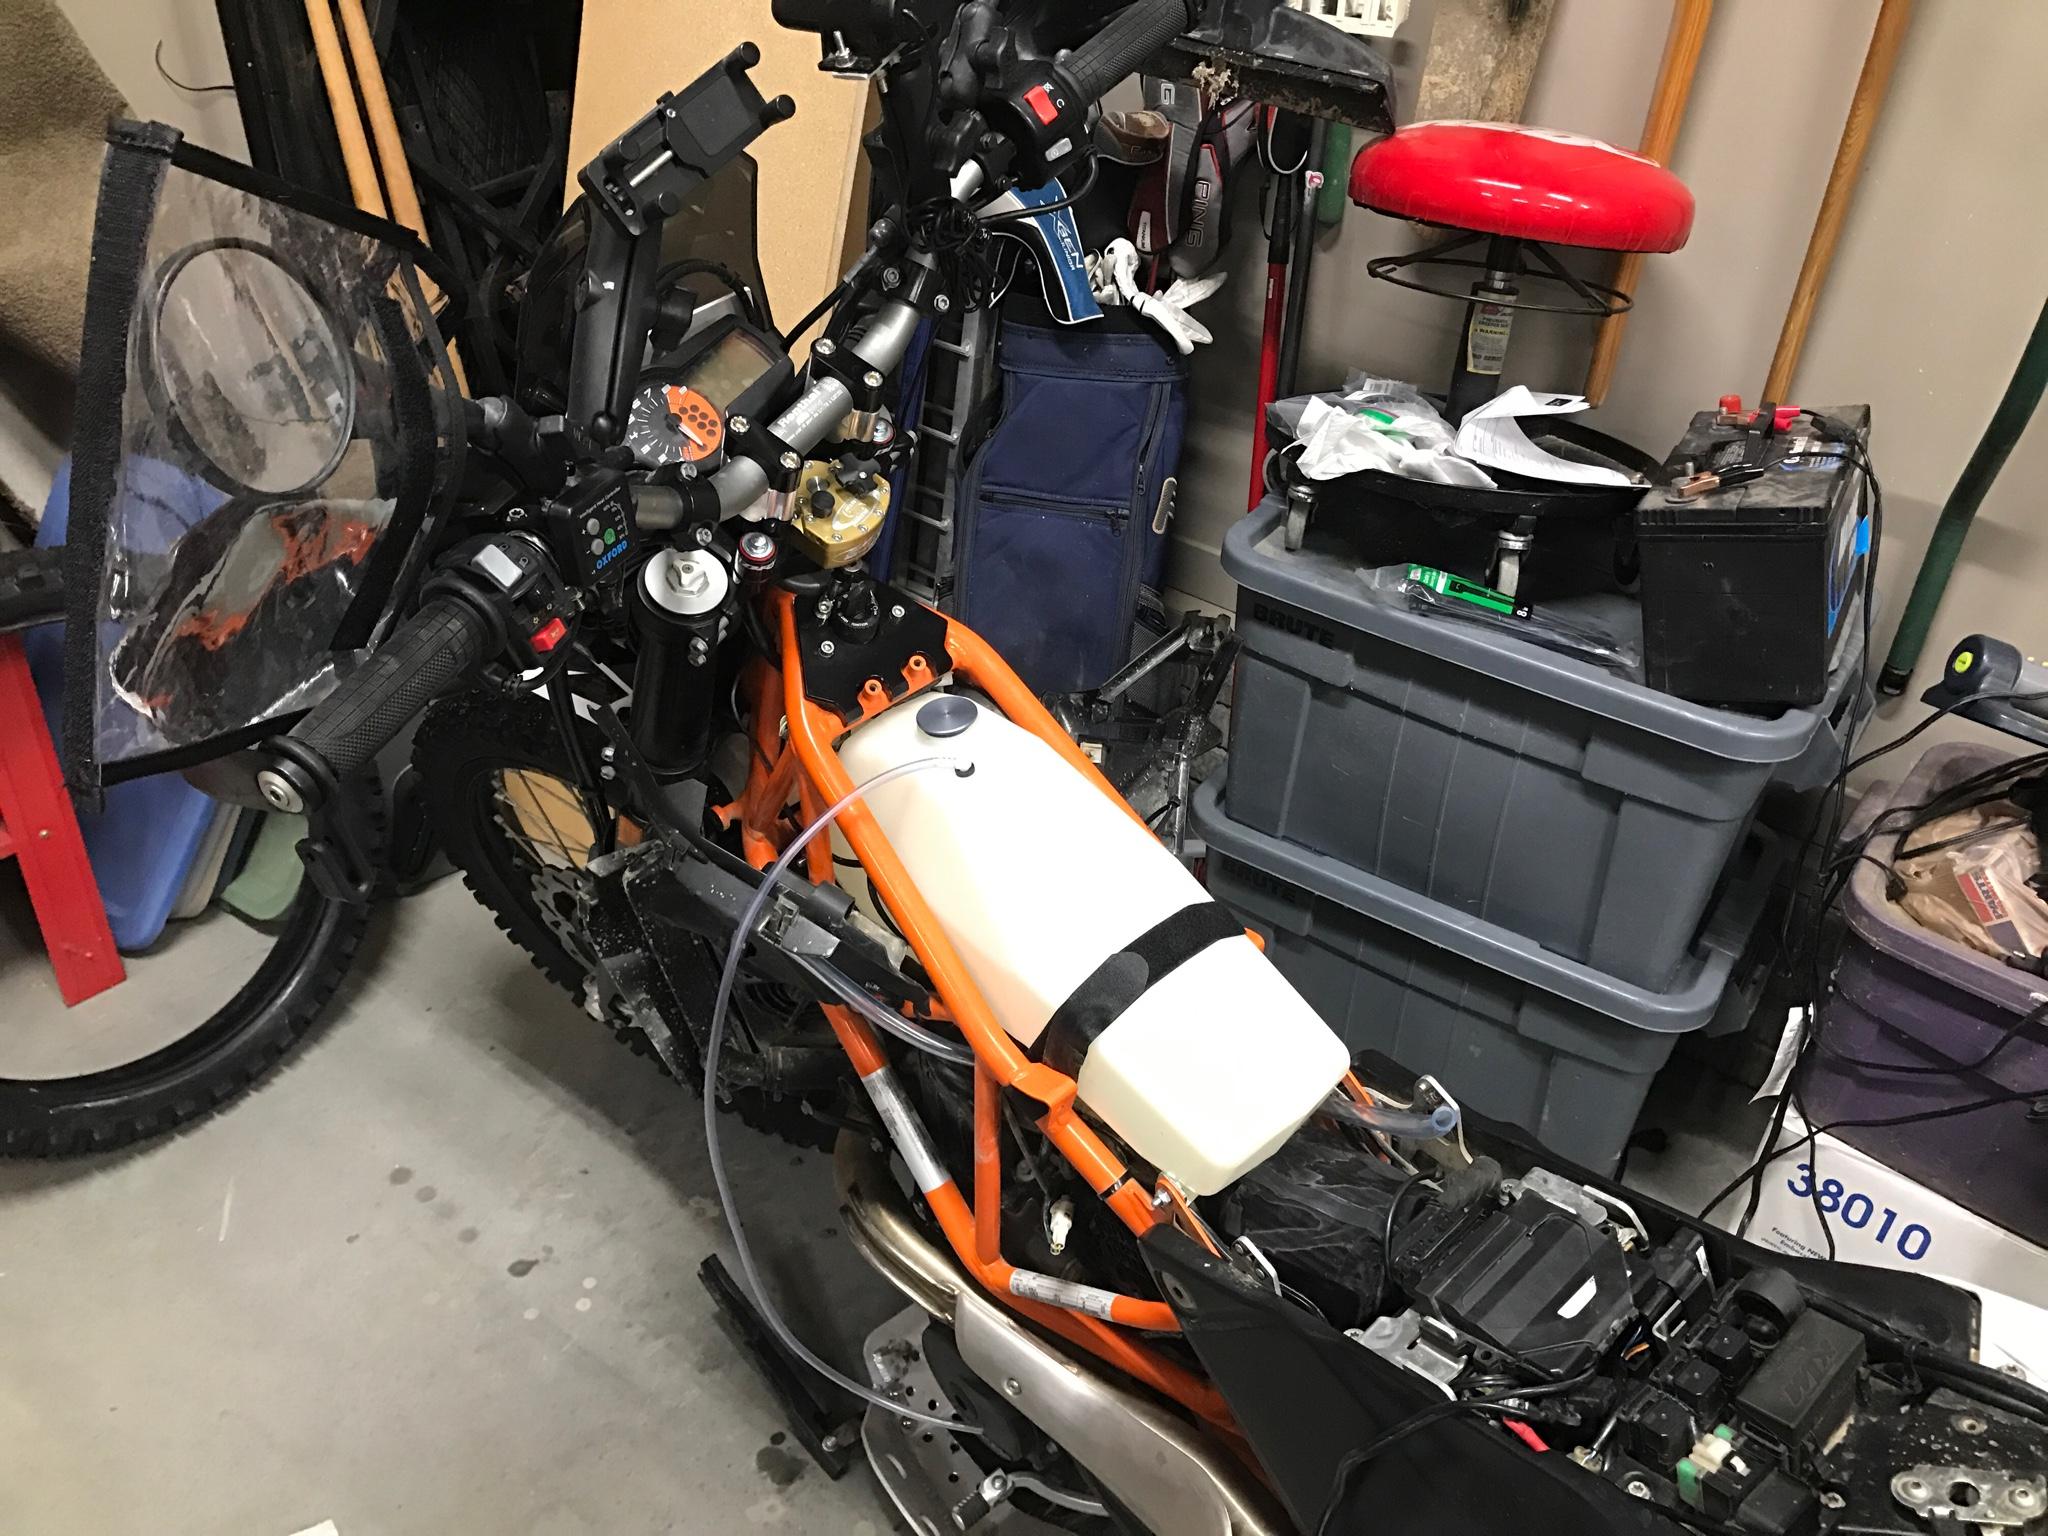 husqvarna 701 enduro fuel tank adventure rider. Black Bedroom Furniture Sets. Home Design Ideas